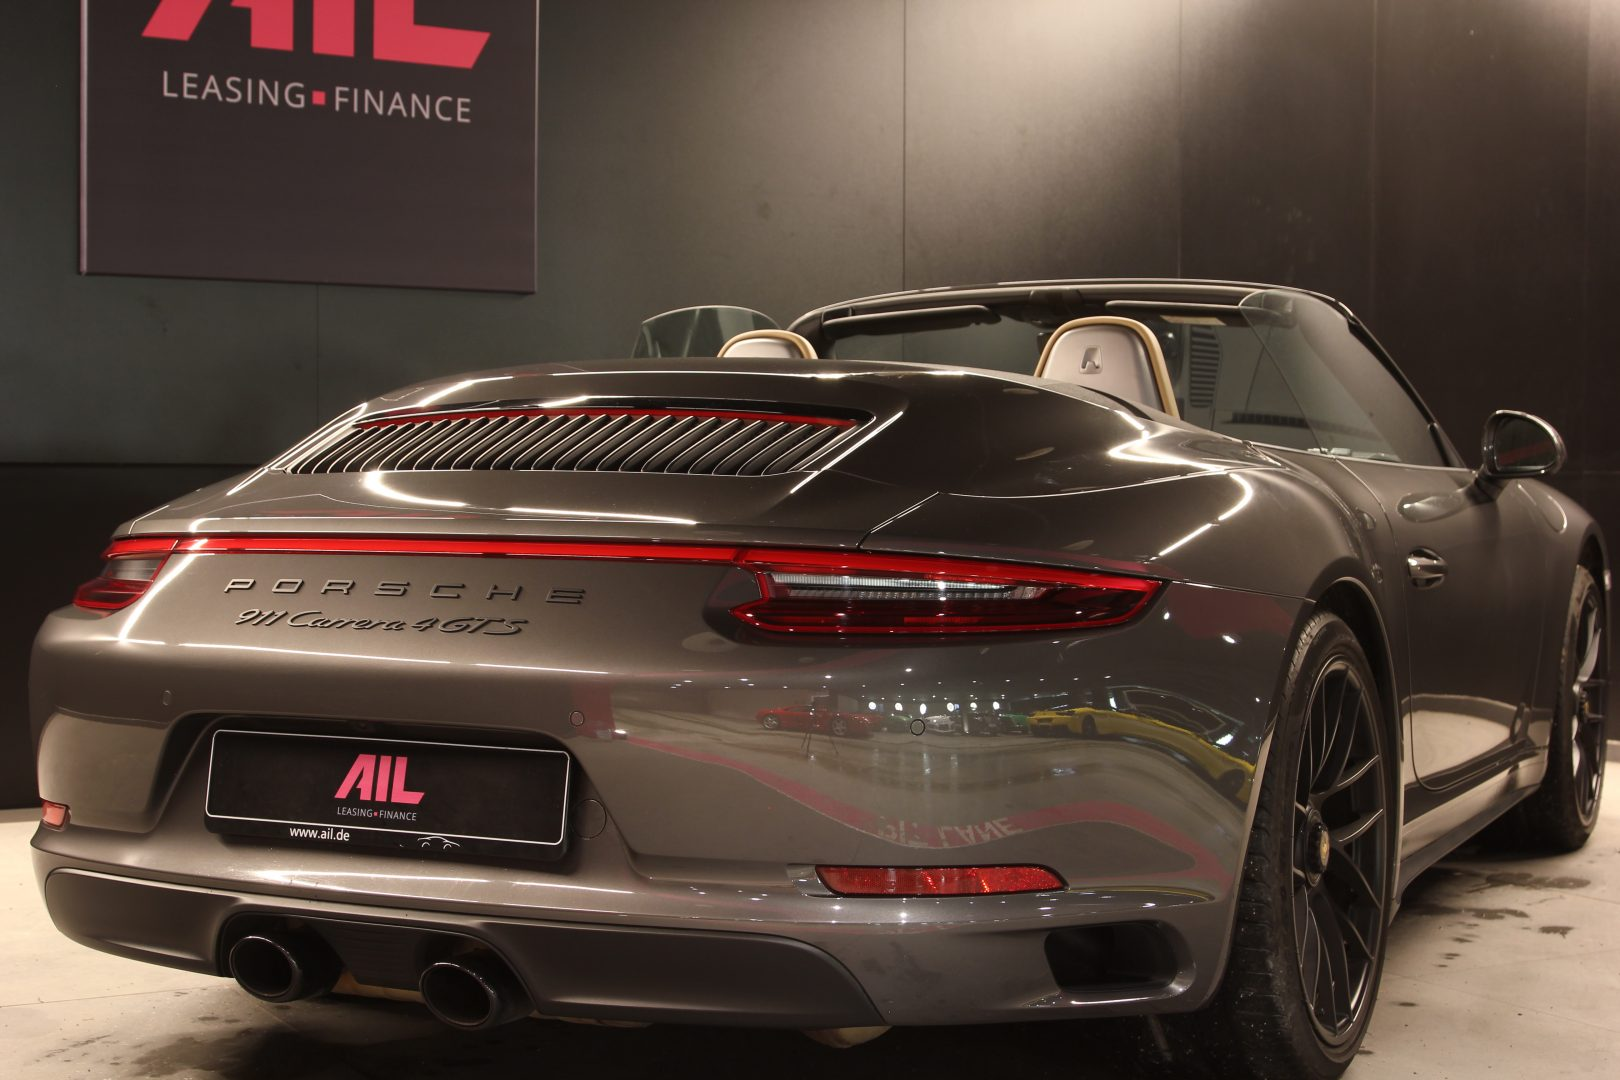 AIL Porsche 991 4 GTS LED BOSE 6